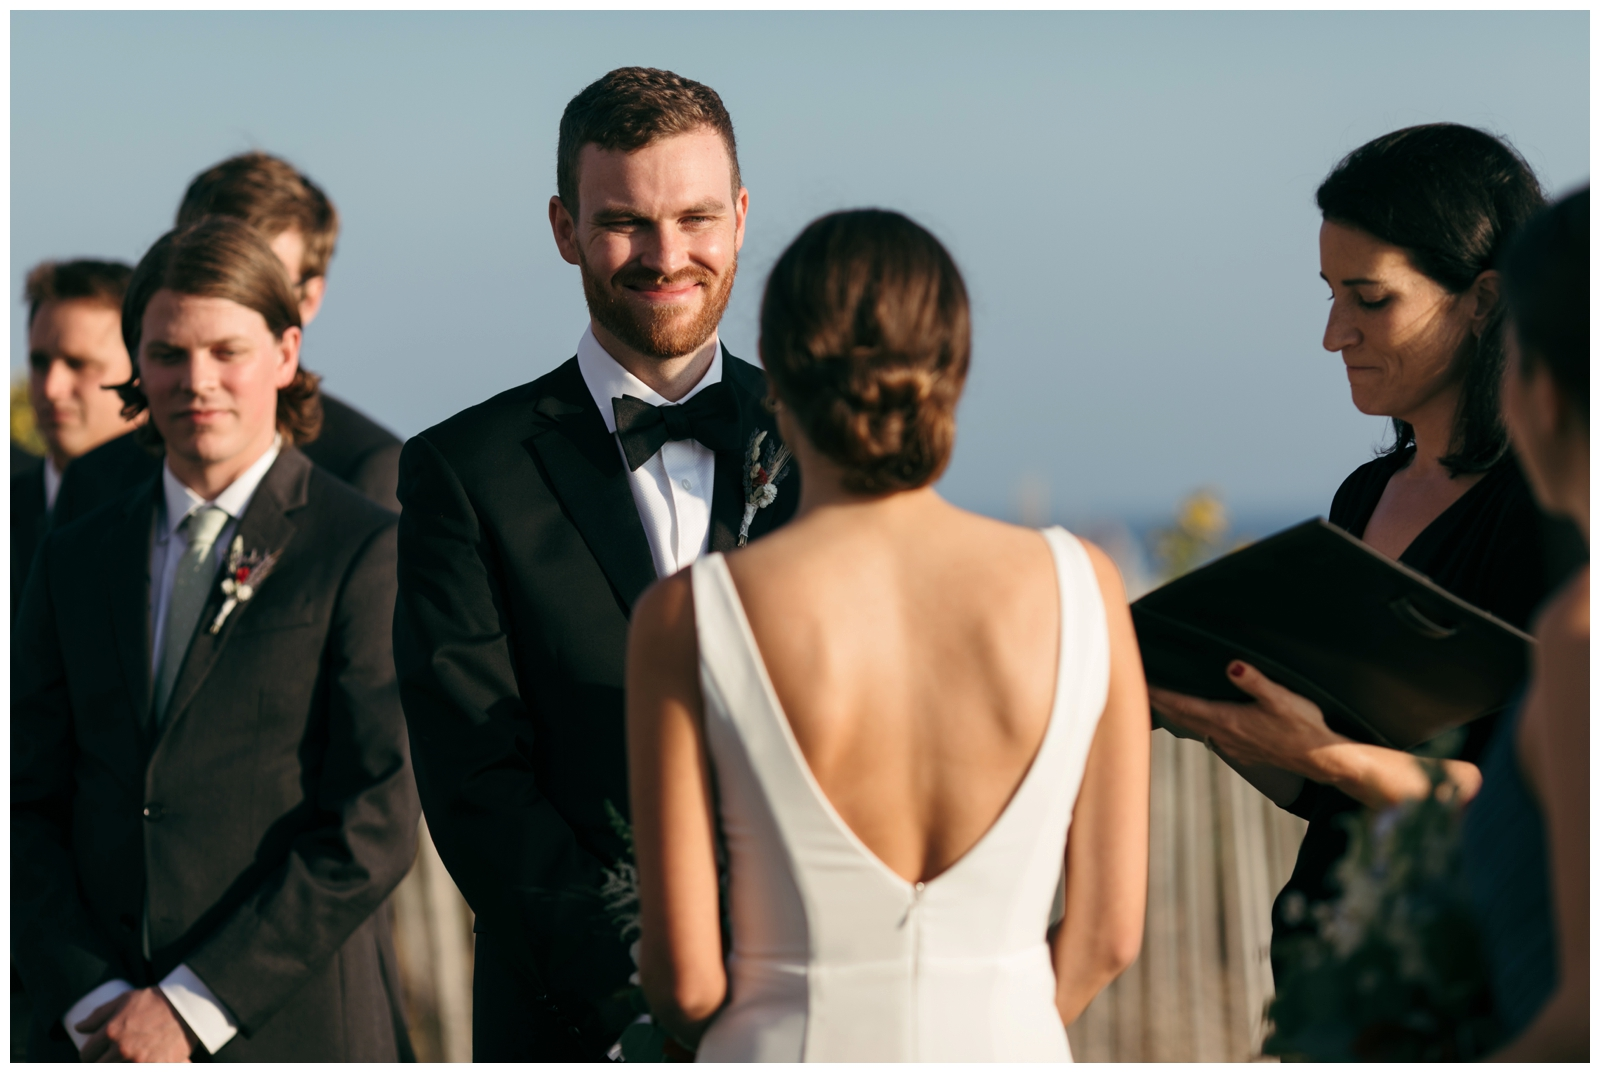 Madison-Beach-Hotel-Wedding-Bailey-Q-Photo-Boston-Wedding-Photographer-032.jpg